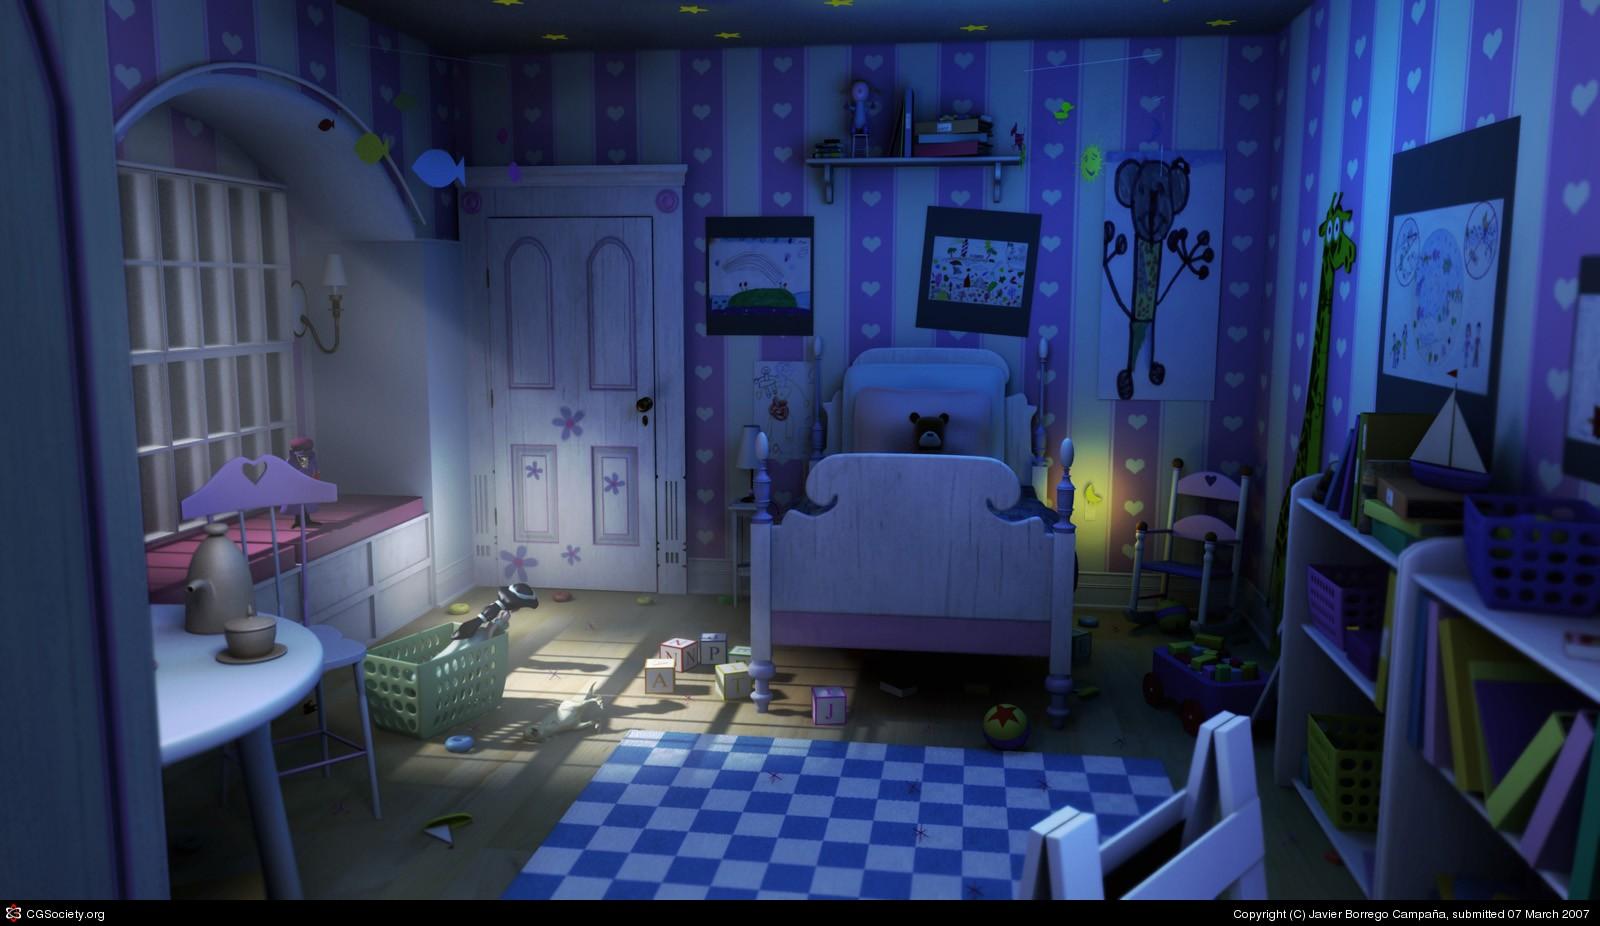 Sources httpwwwcgsocietyorgcgsarchivenewgallerycritsg522034522034521173281244largejpg The Bedroom Scene